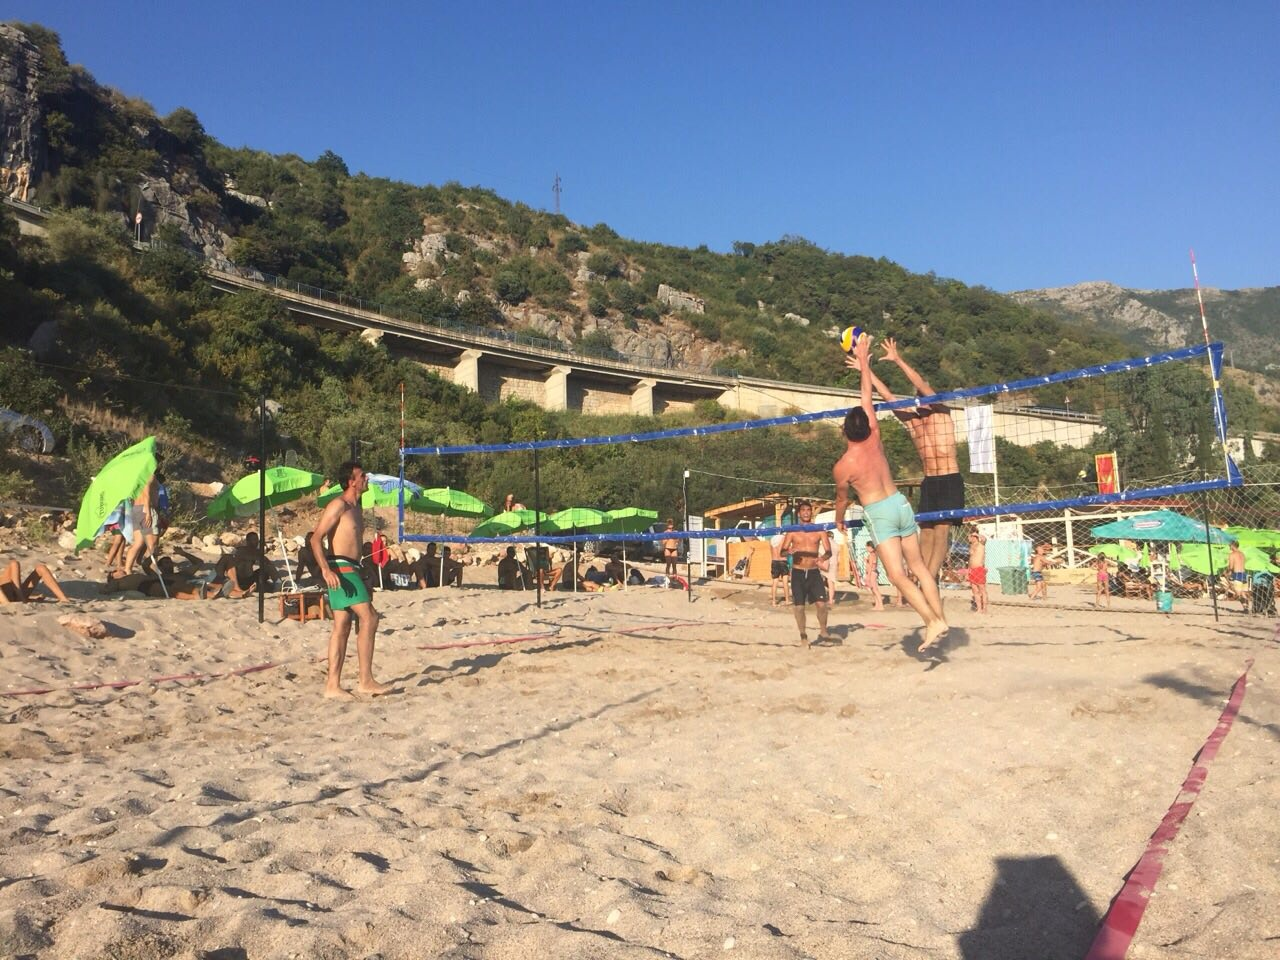 odbojka na pijesku kamenovo beach volley montenegro crna gora oscg expand the net 3